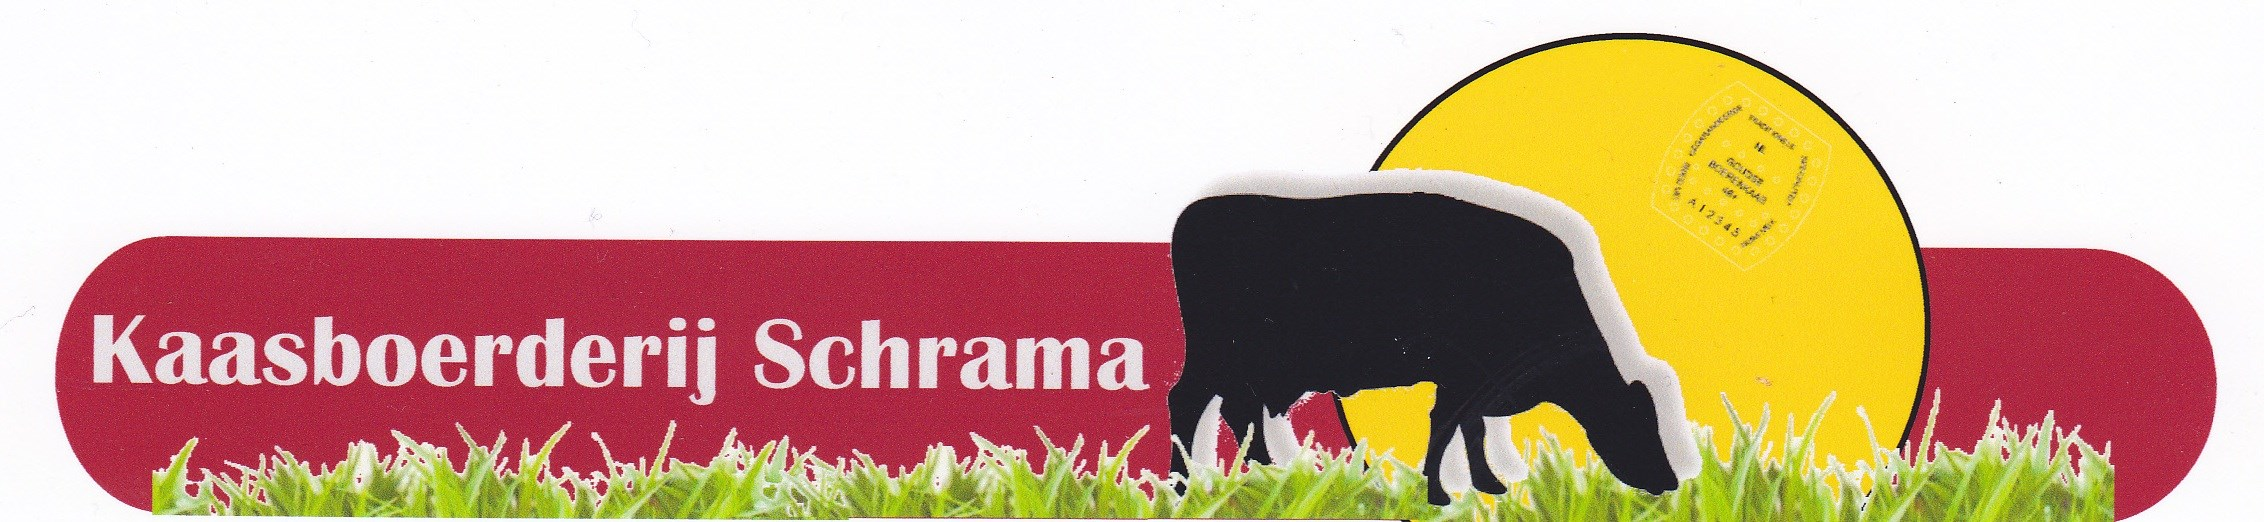 Kaasboerderij Schrama